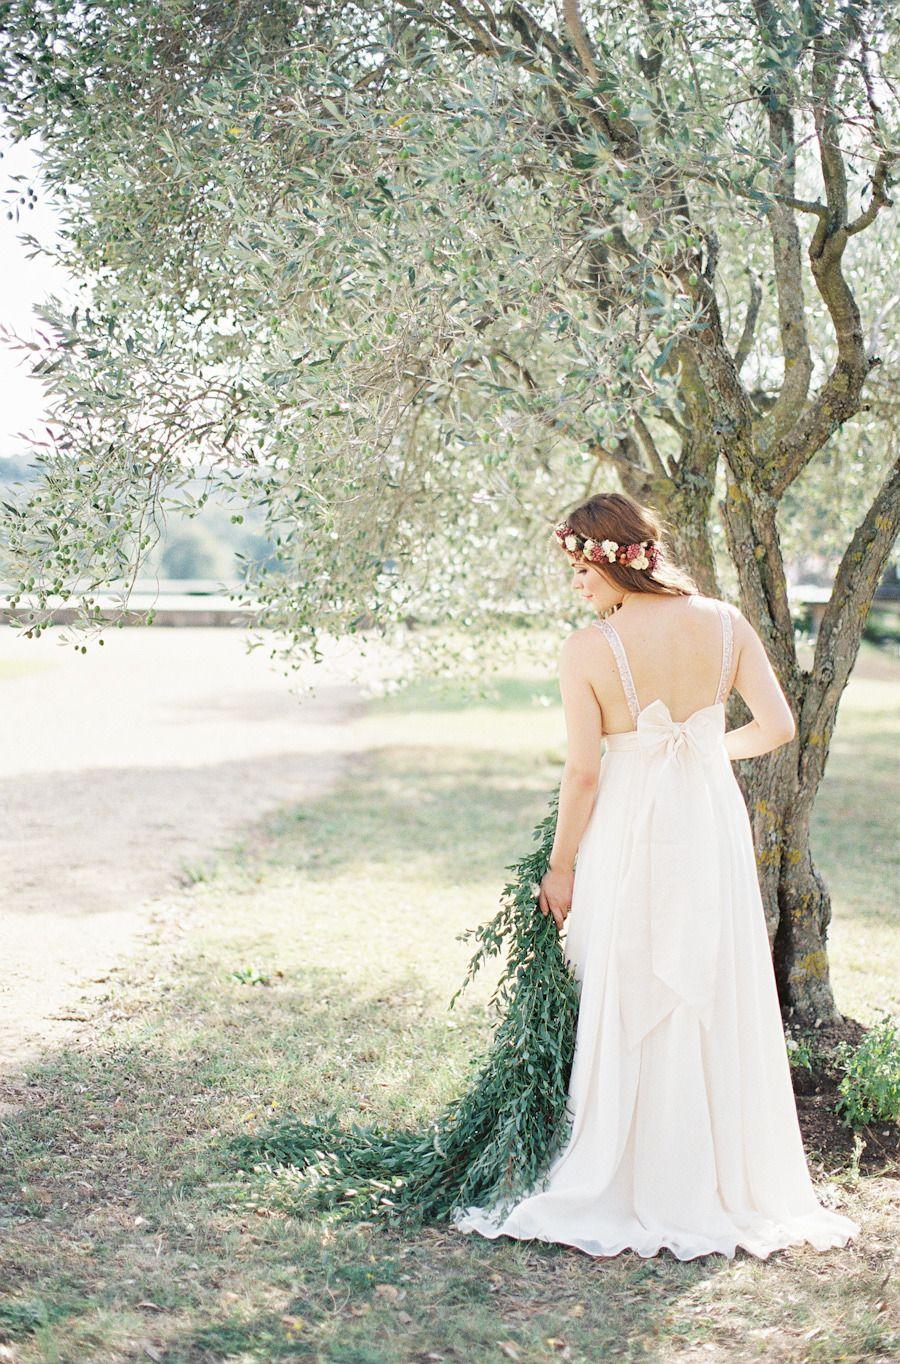 Destination Wedding Dress | Photography: Cat Hepple - www.cathepplephotography.com/ Read More: http://www.stylemepretty.com/little-black-book-blog/2014/12/18/romantic-provencal-fig-berry-wedding-inspiration/